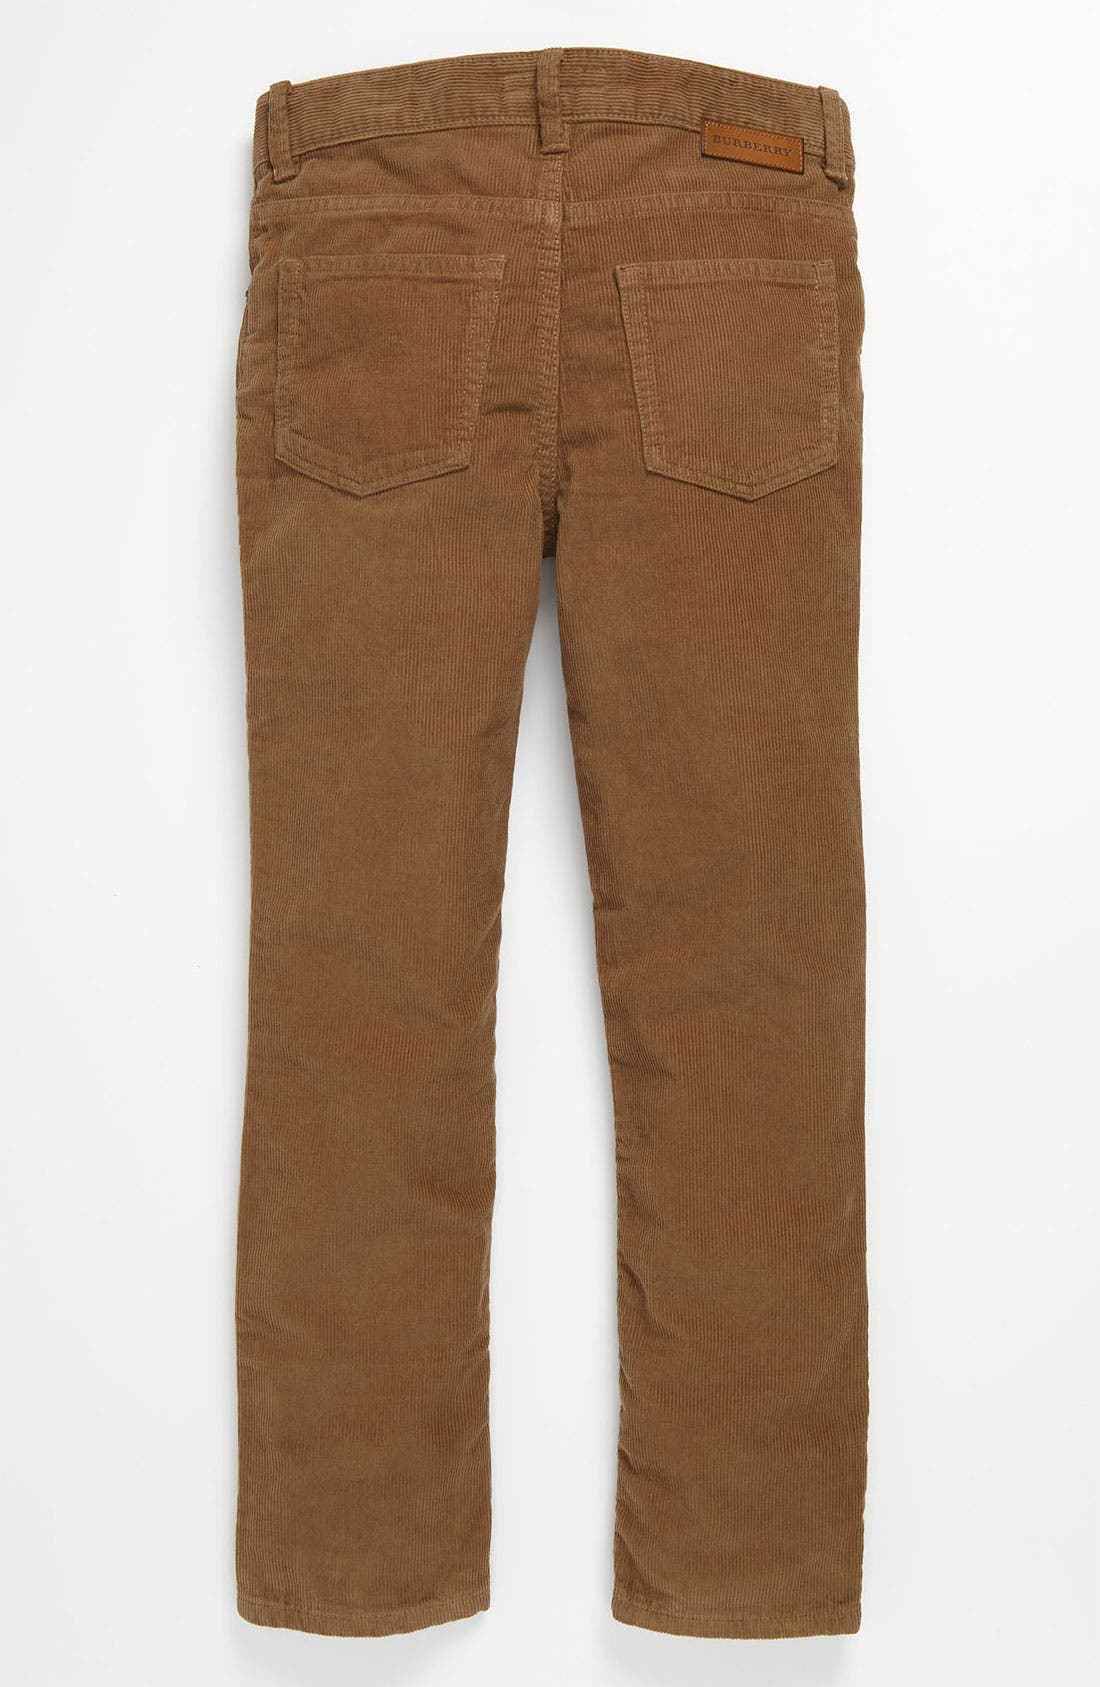 Main Image - Burberry Corduroy Pants (Little Boys)